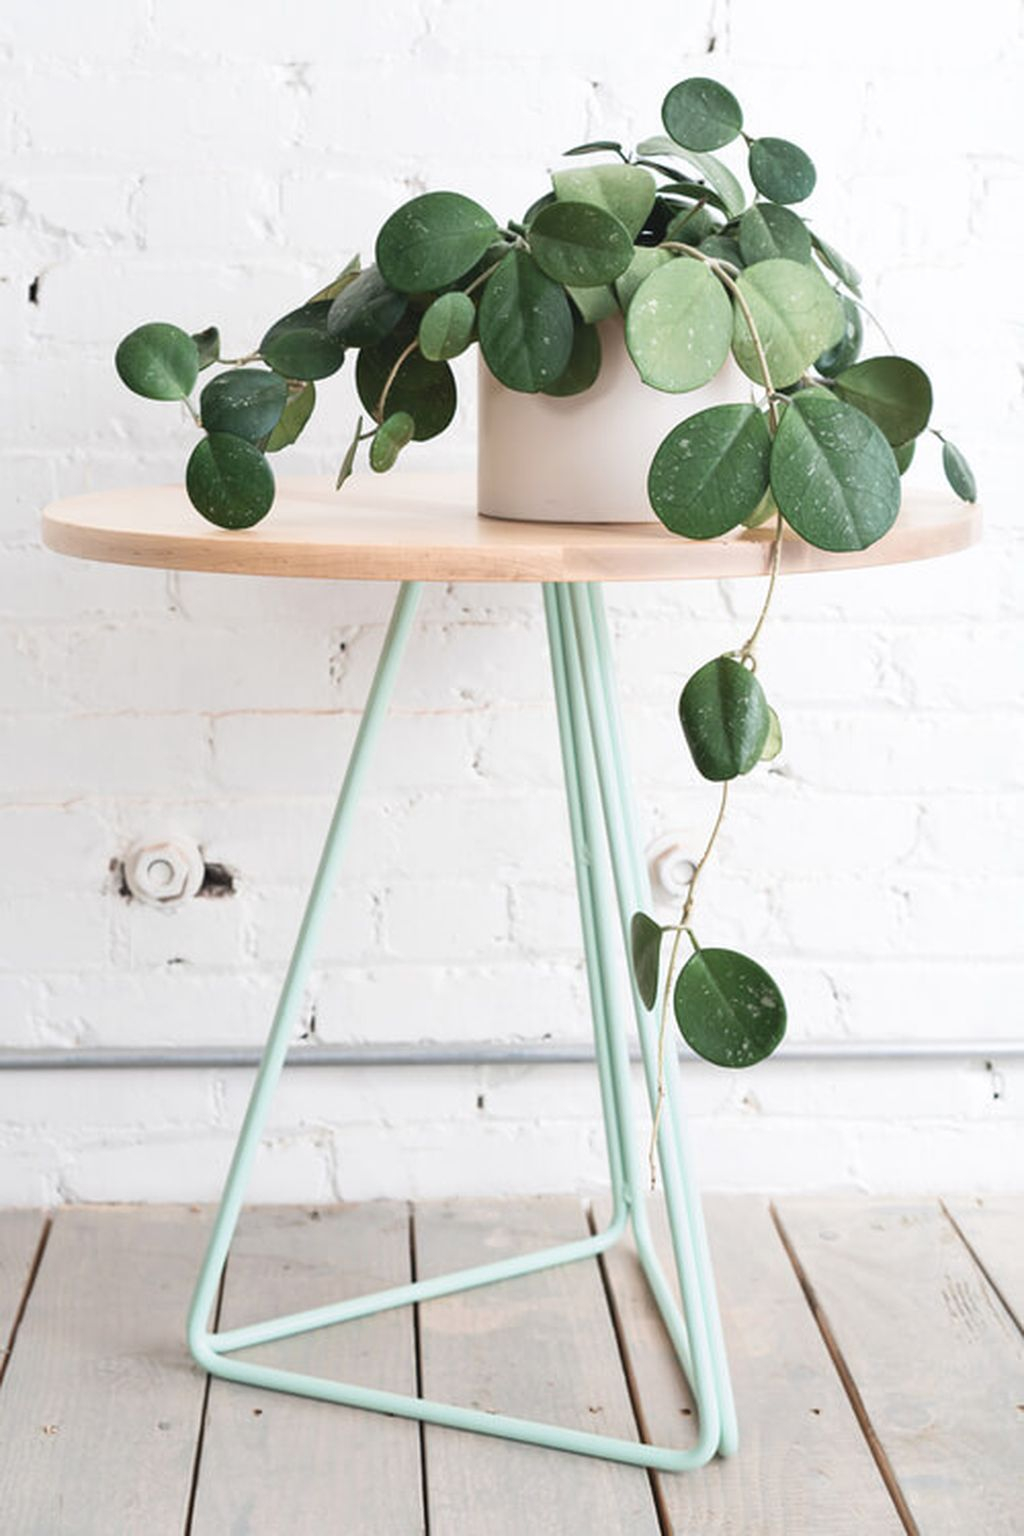 Inspiring Indoor Plans Garden Ideas To Makes Your Home More Cozier 61